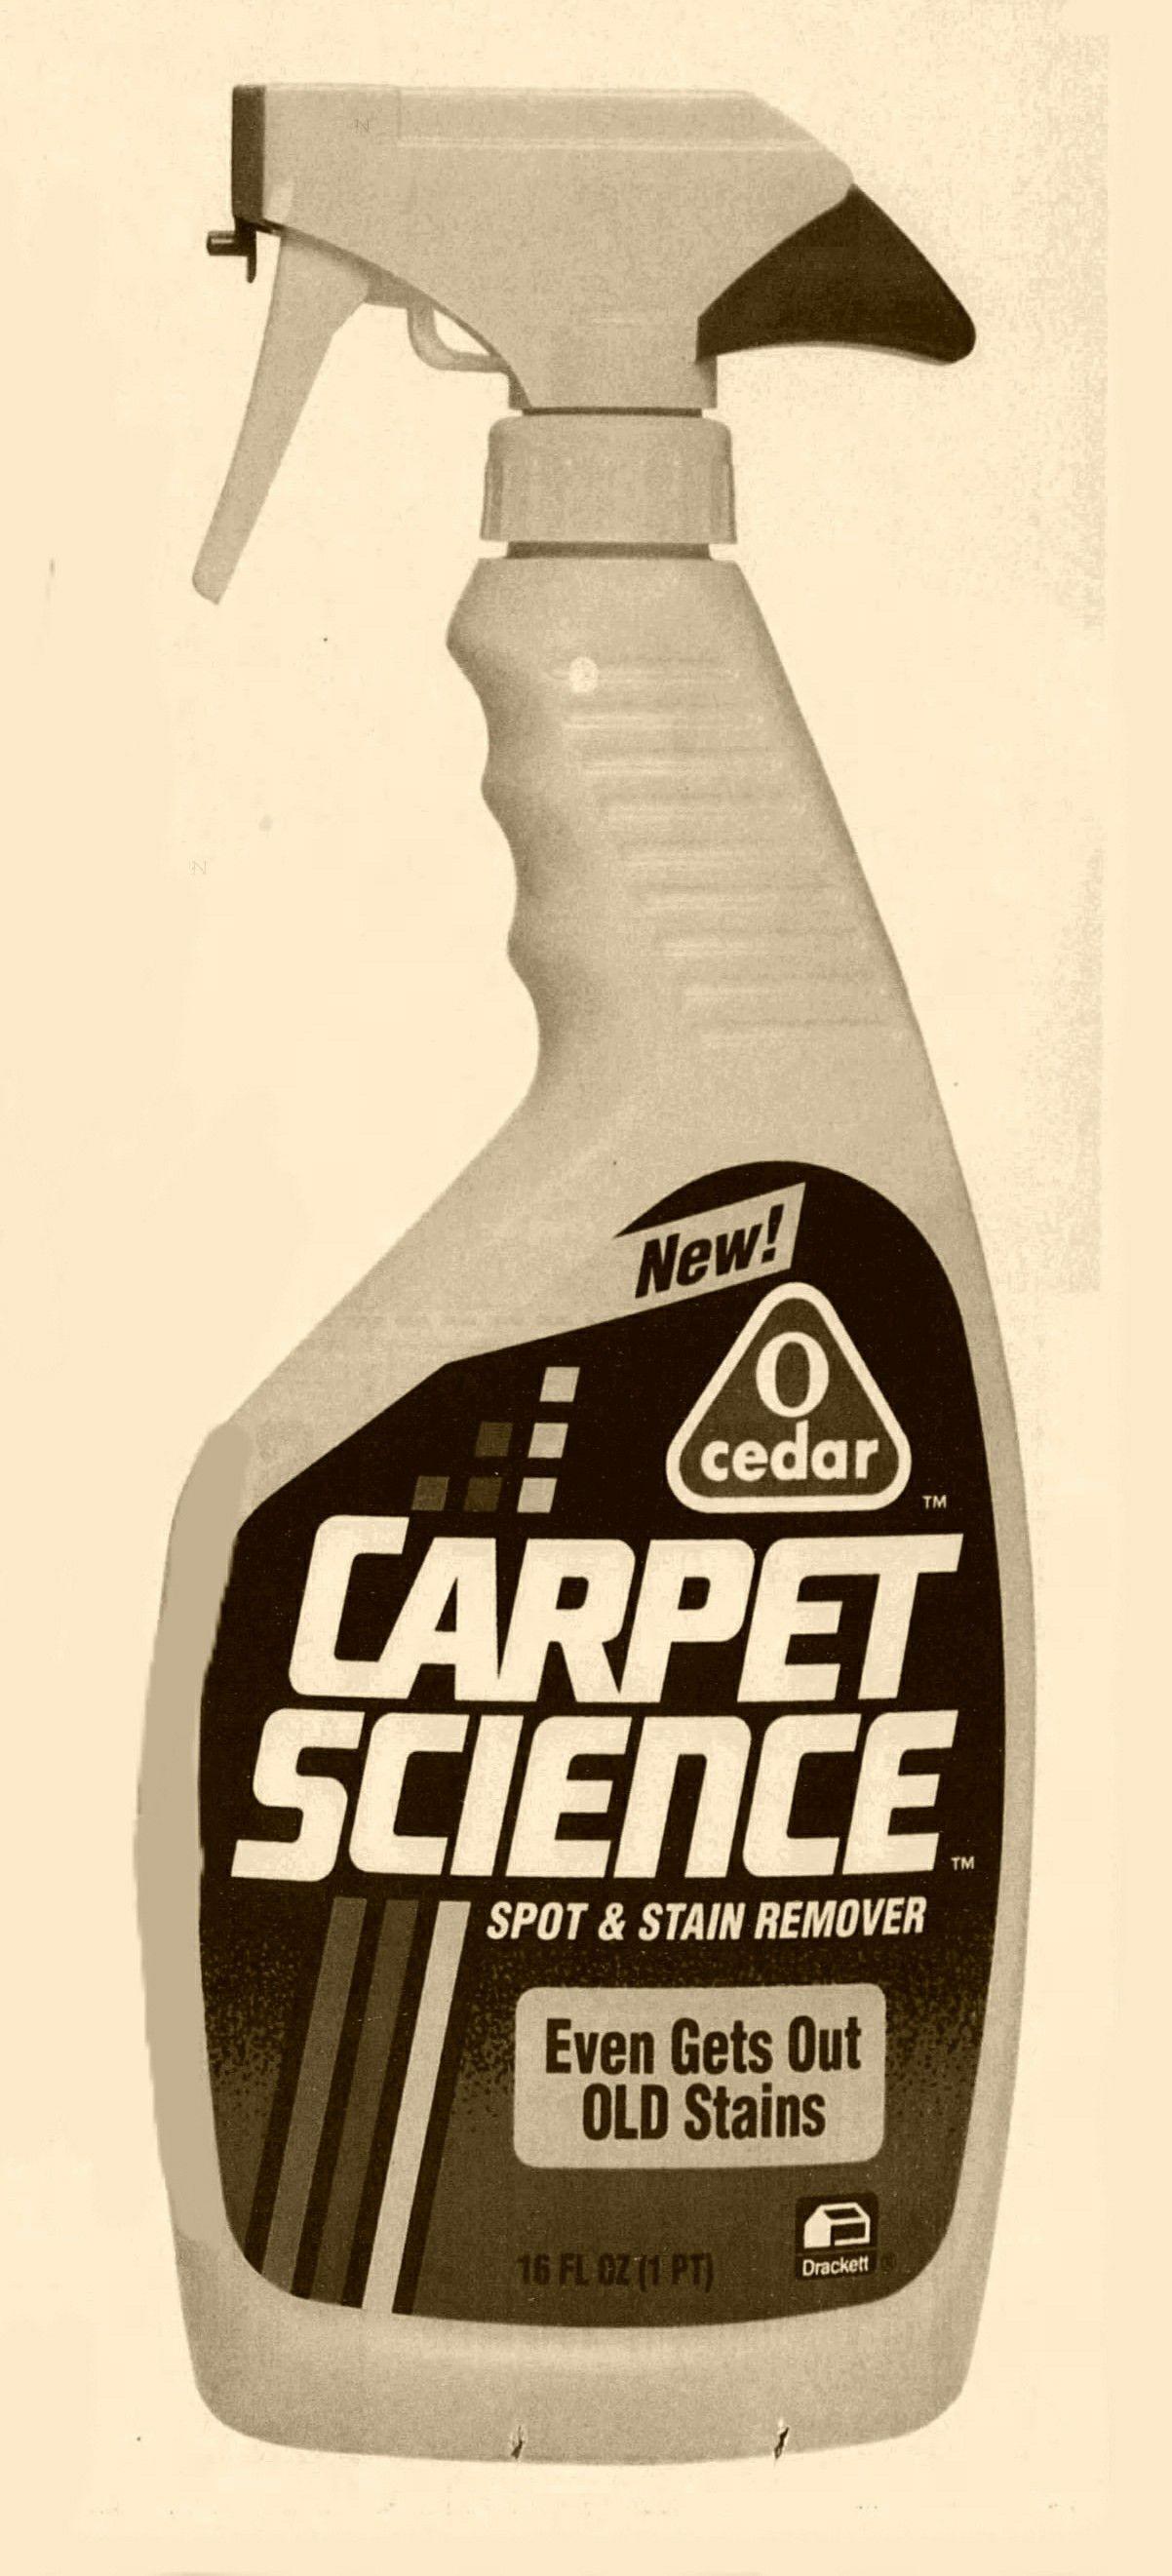 O Cedar Carpet Science Spot Stain Remover Bottle 1990s The